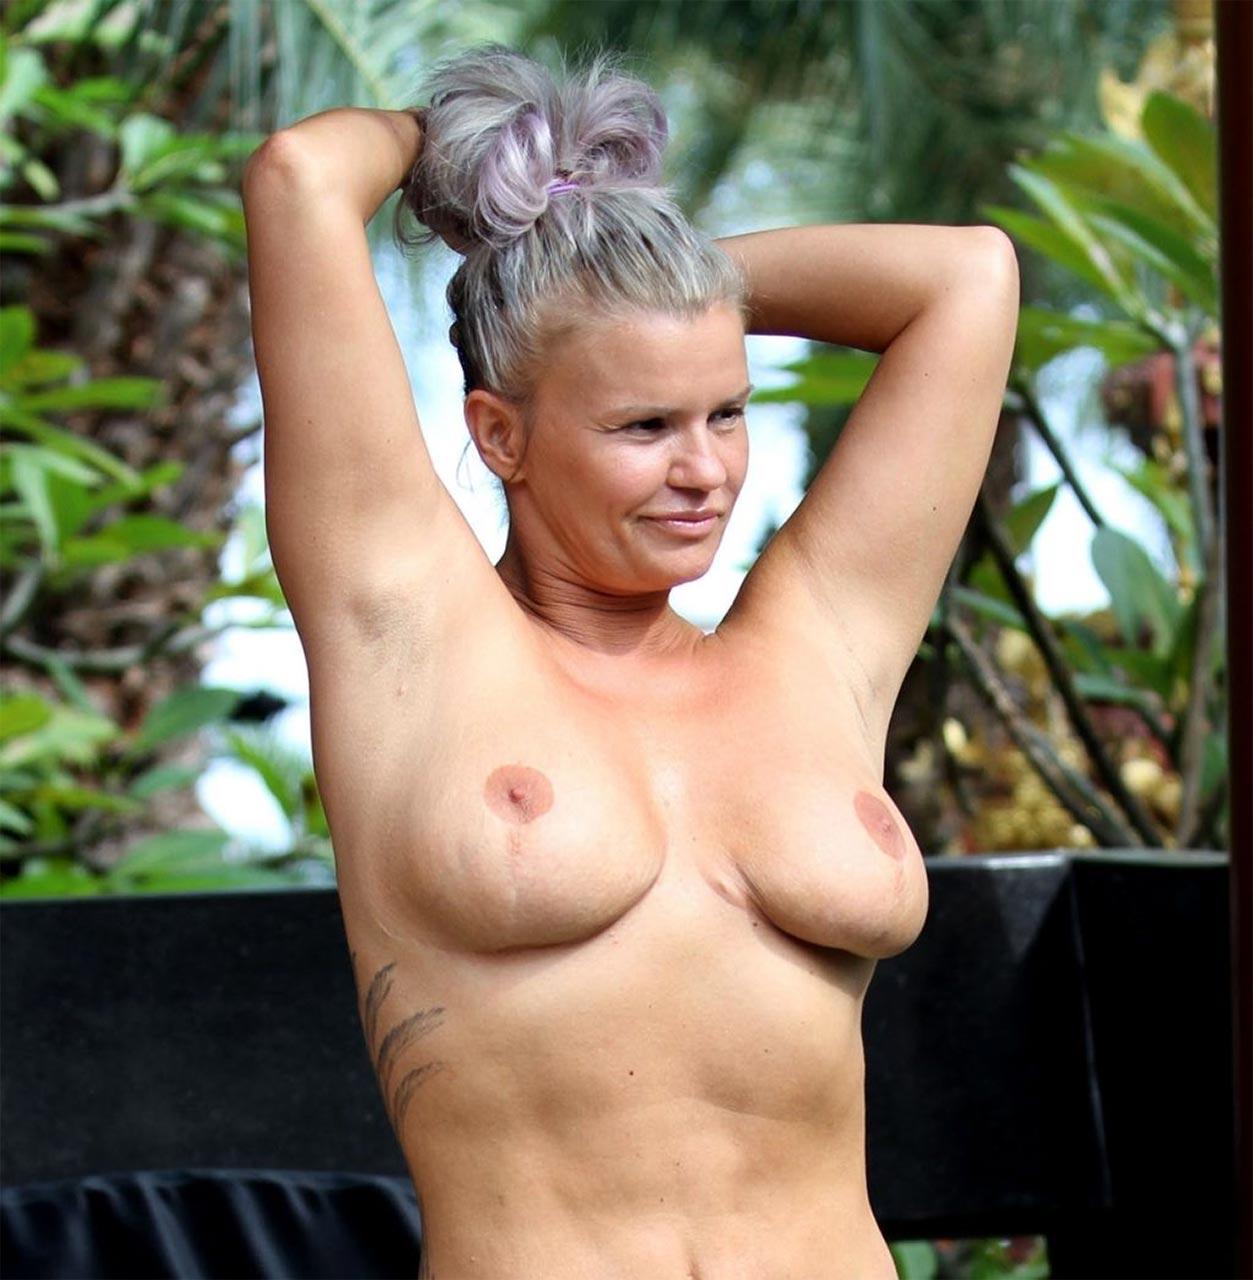 Kerry katona huge tits